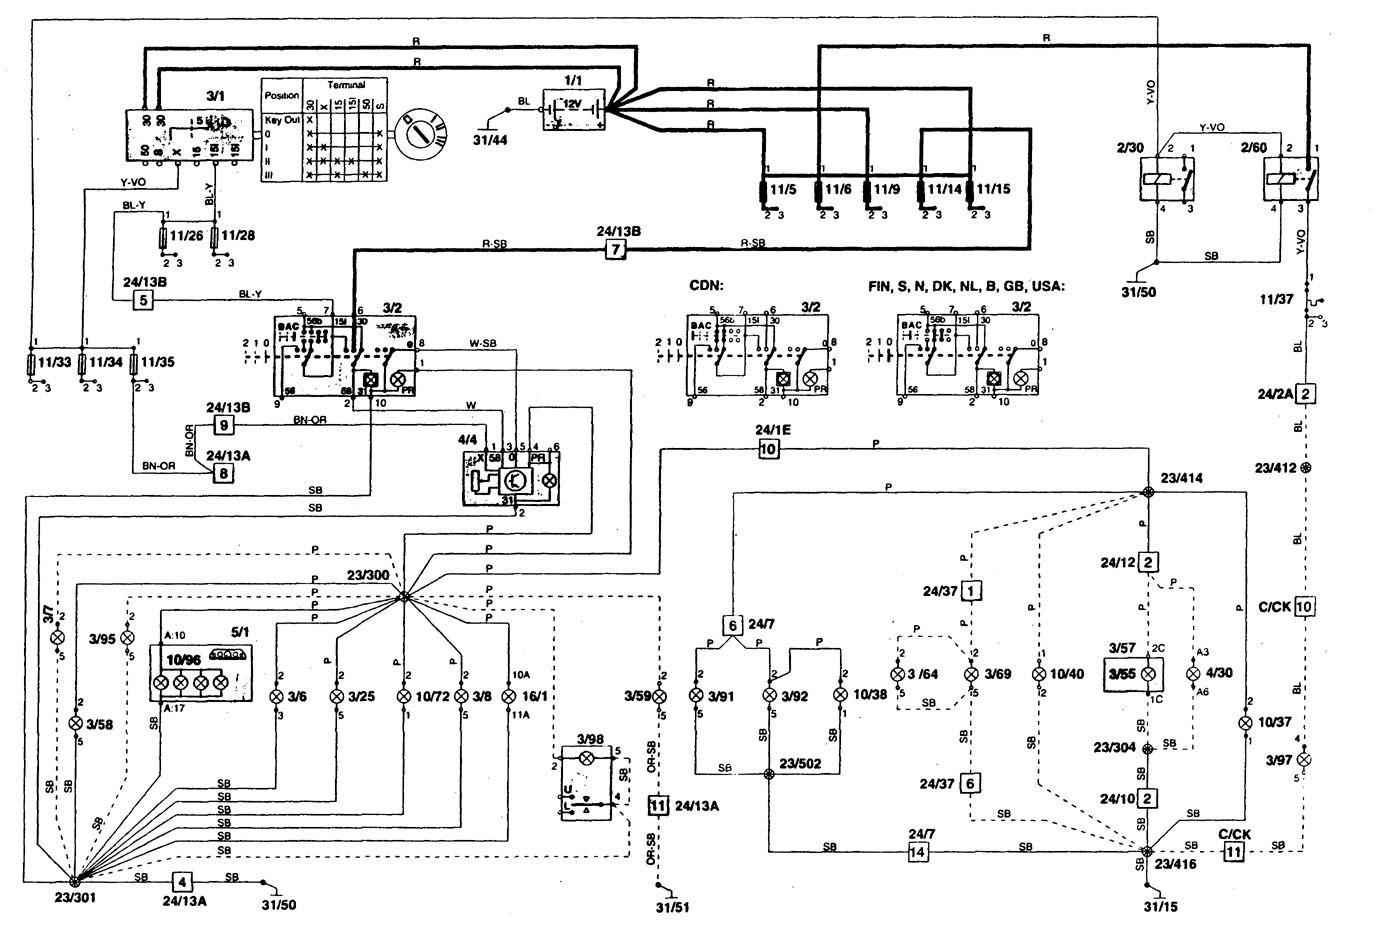 ZD_5620] Volvo 850 Ecu Wiring Diagram Free DiagramTeria Argu Inoma Mill Osoph Ogram Bemua Hyedi Mentra Gram Skat Peted Phae  Mohammedshrine Librar Wiring 101